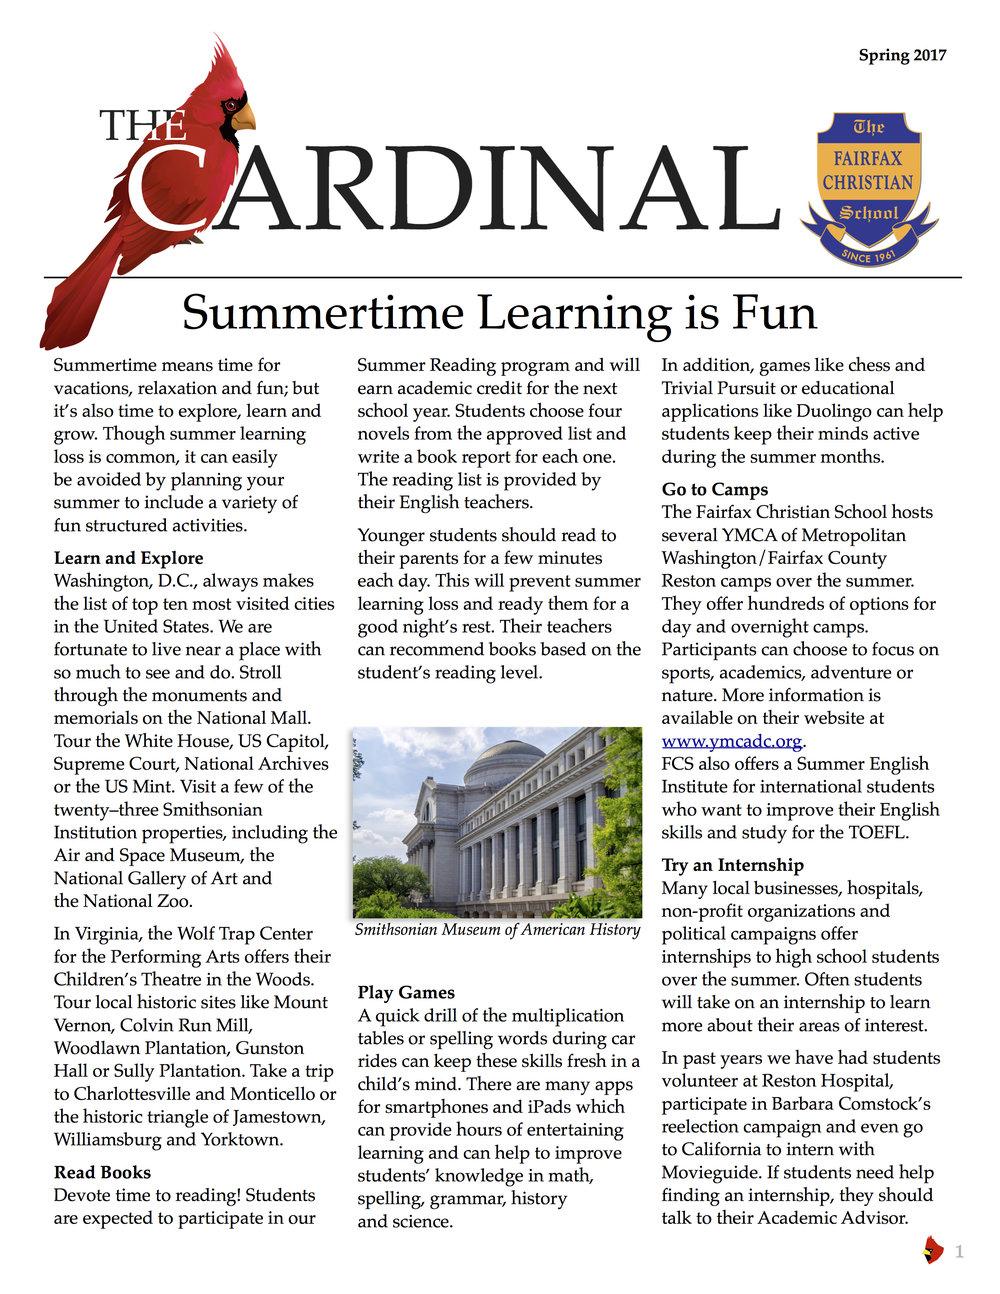 Cover Image 2016–2017 Spring Cardinal.1.jpg